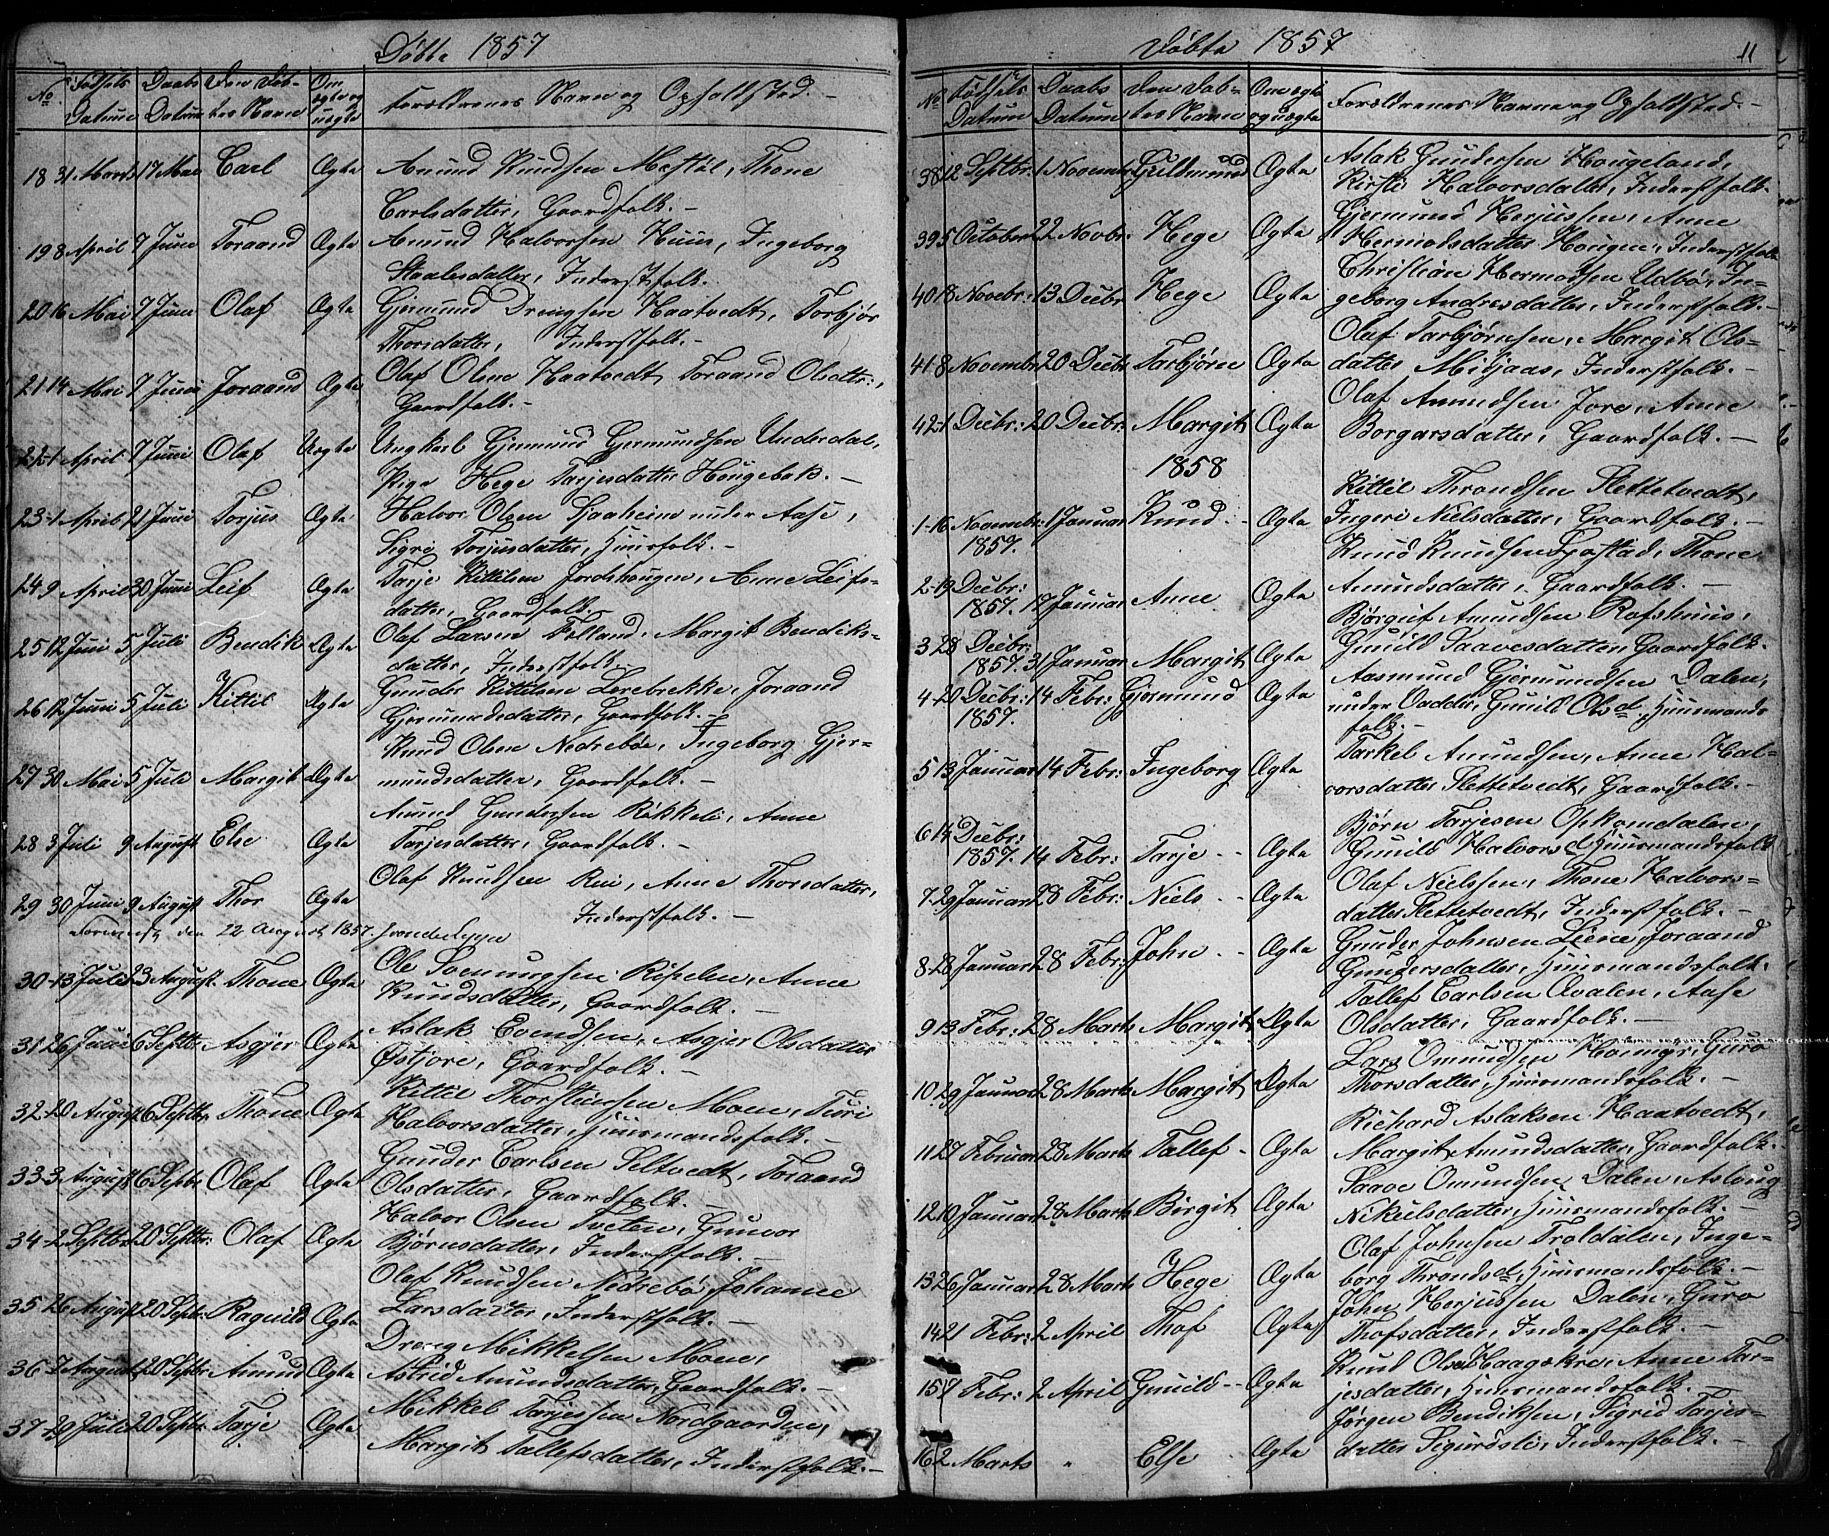 SAKO, Mo kirkebøker, G/Ga/L0001: Klokkerbok nr. I 1, 1851-1891, s. 11